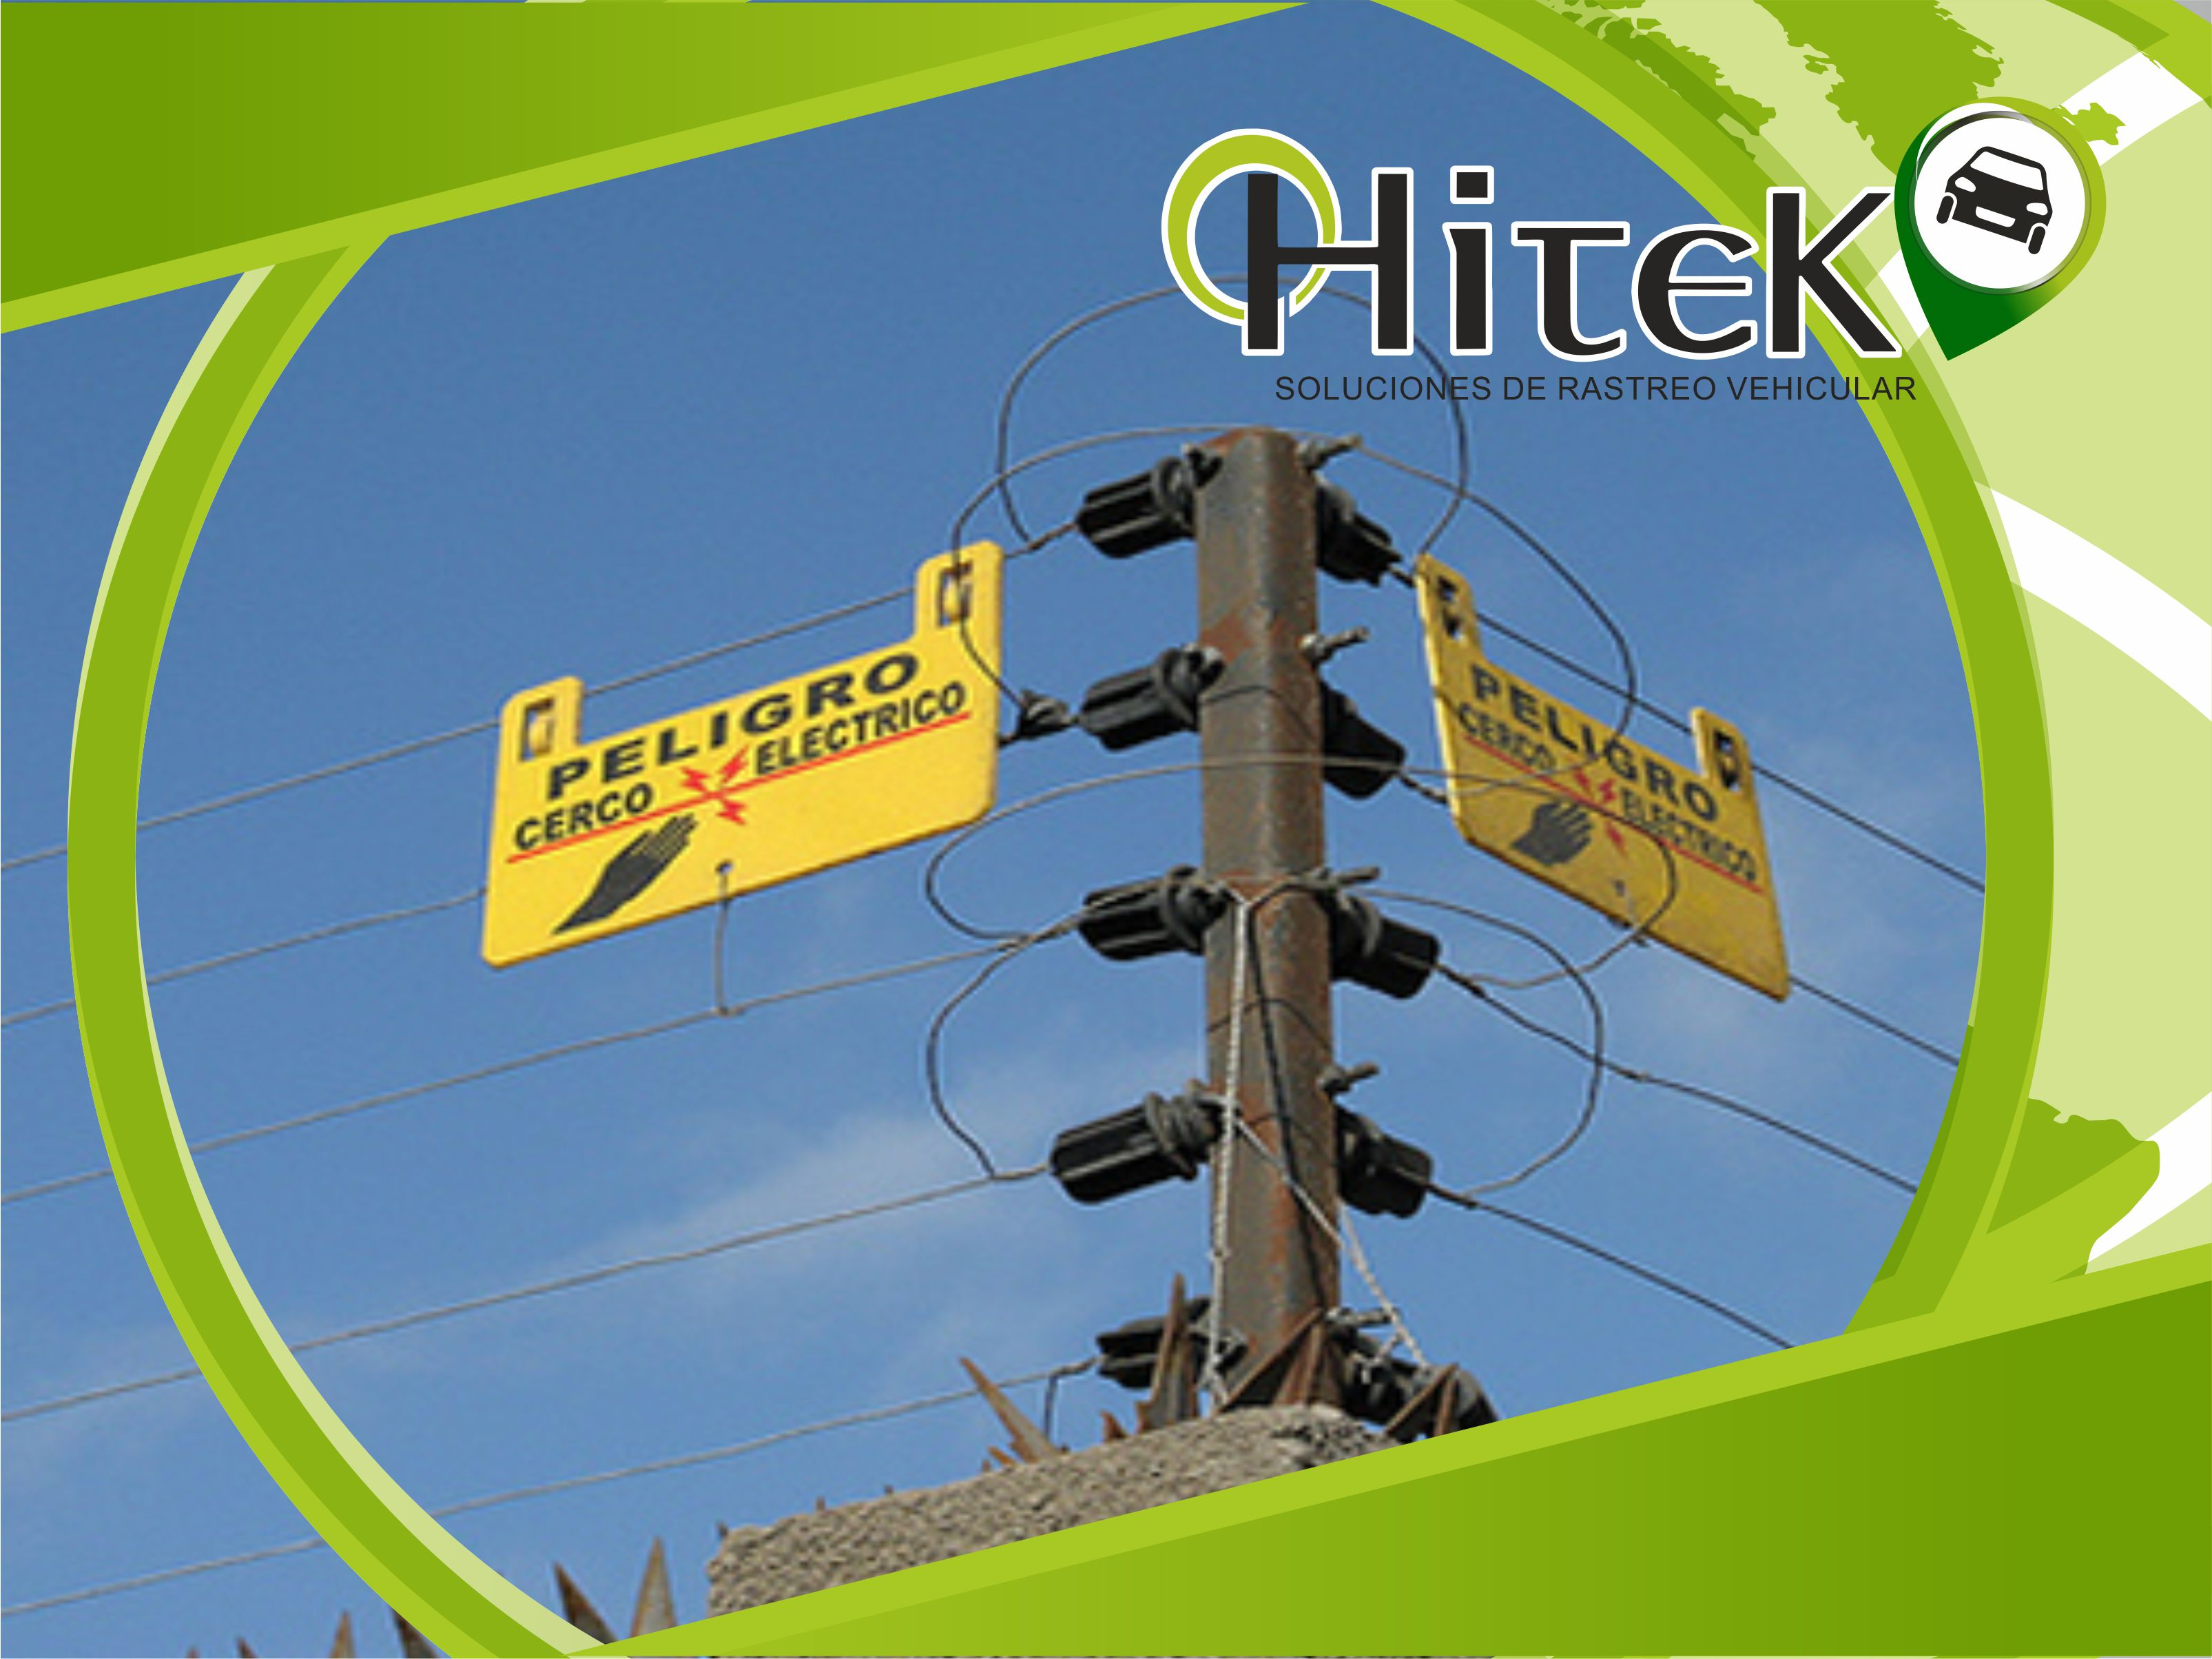 hitek banners pagina web 2 4